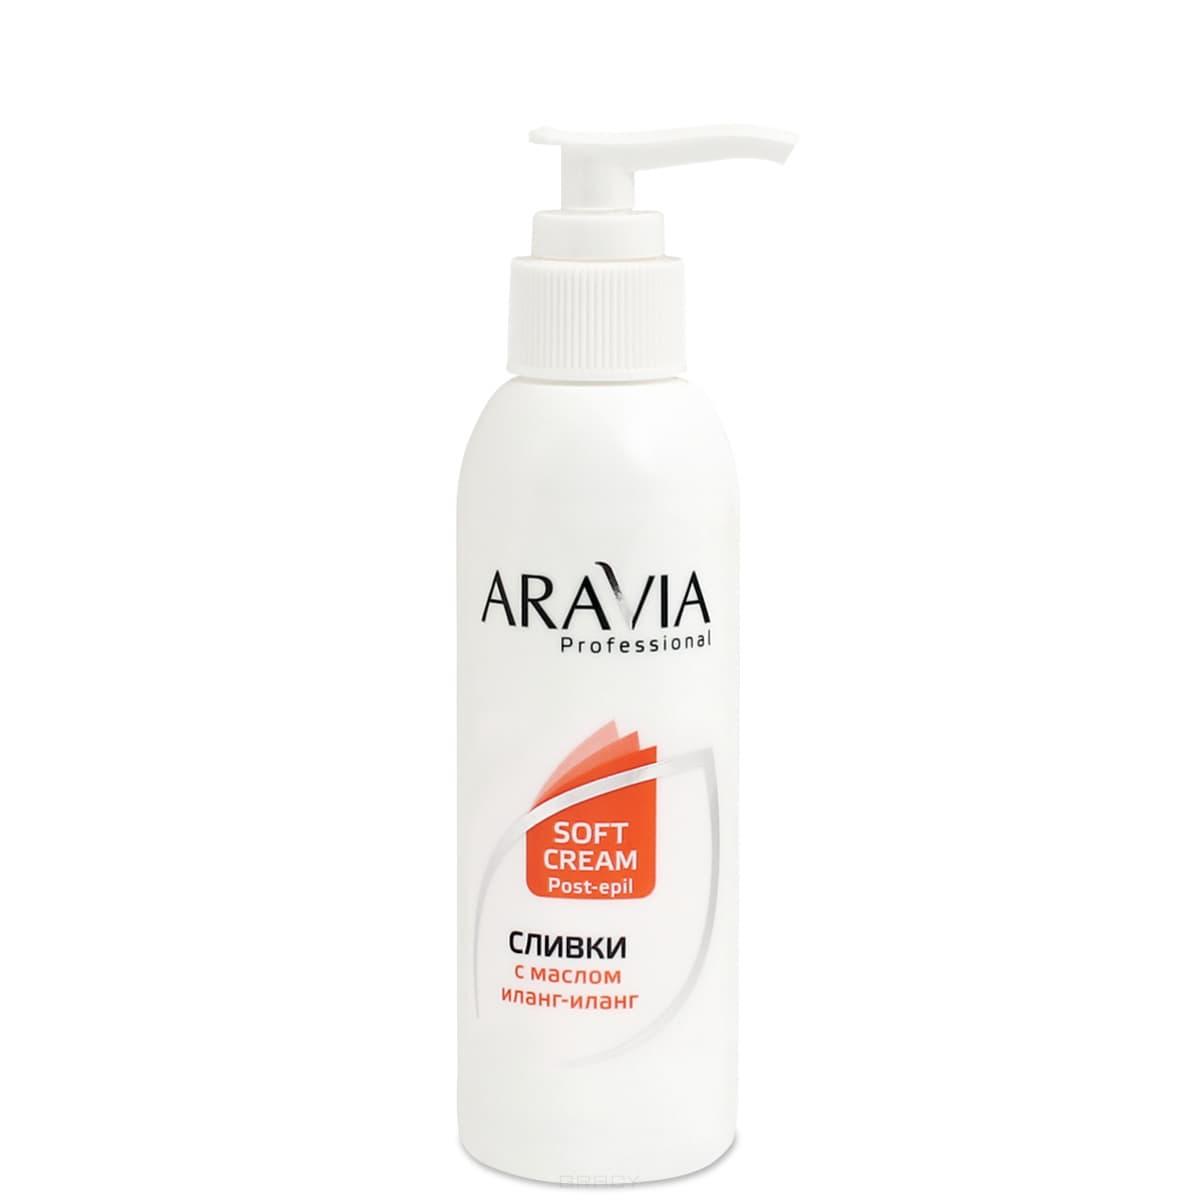 Aravia, Сливки для восстановления рН кожи с маслом иланг-иланг (флакон с дозатором), 150 мл